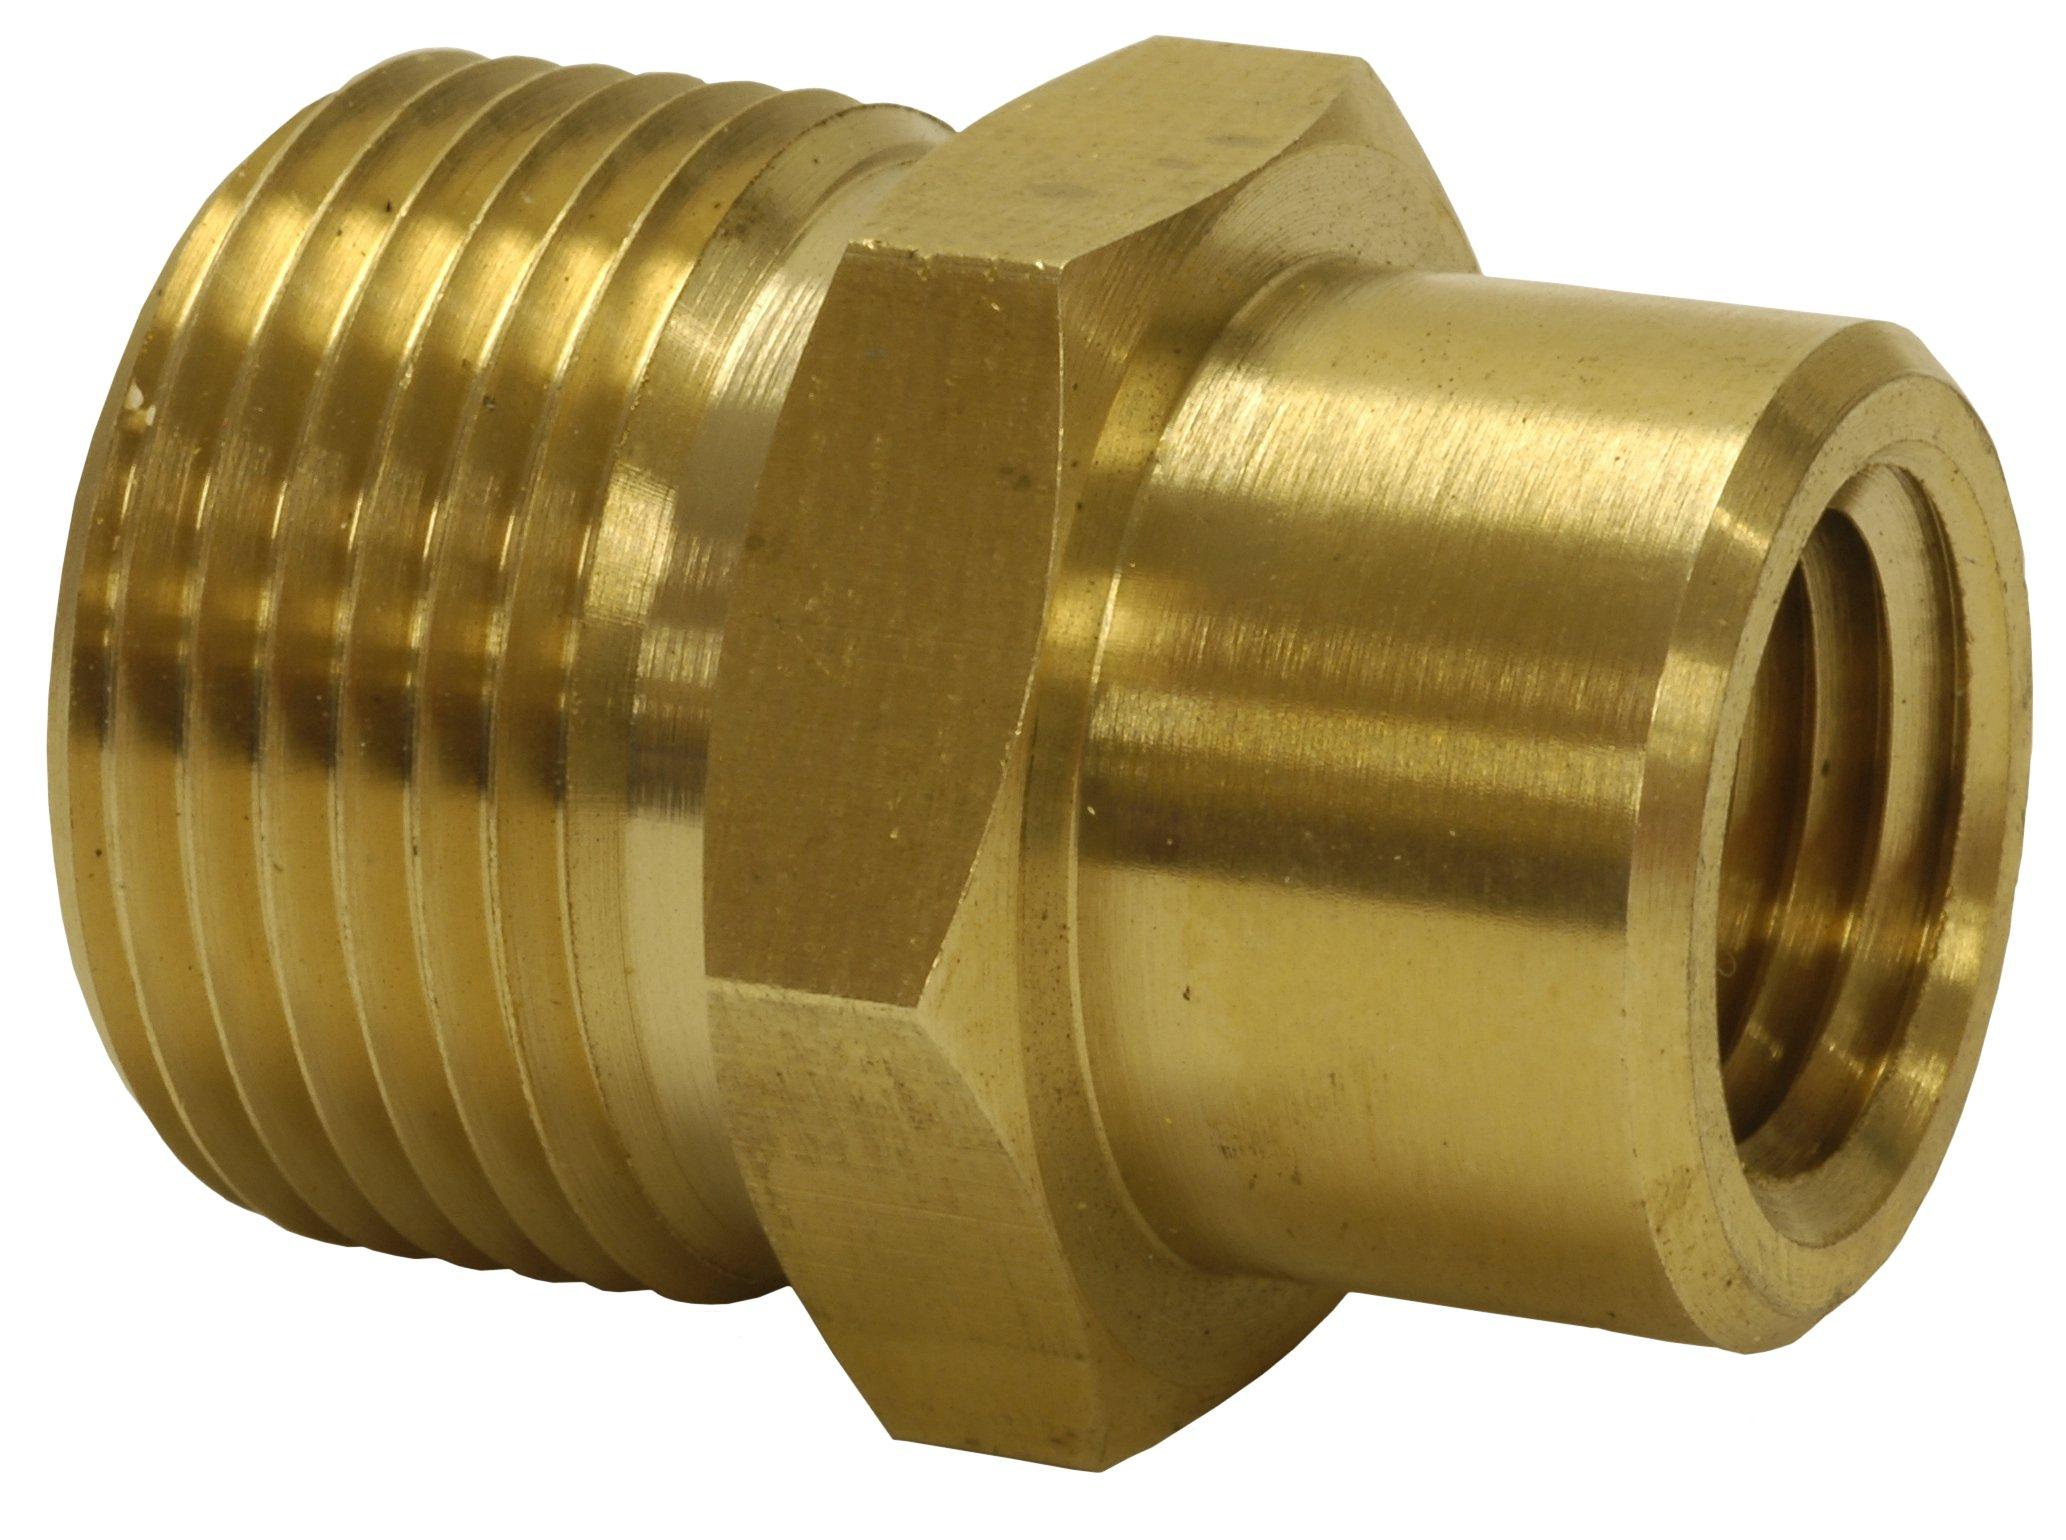 Hot Max 29004 M22M x 1/4-Inch Pressure Washer Screw Nipple